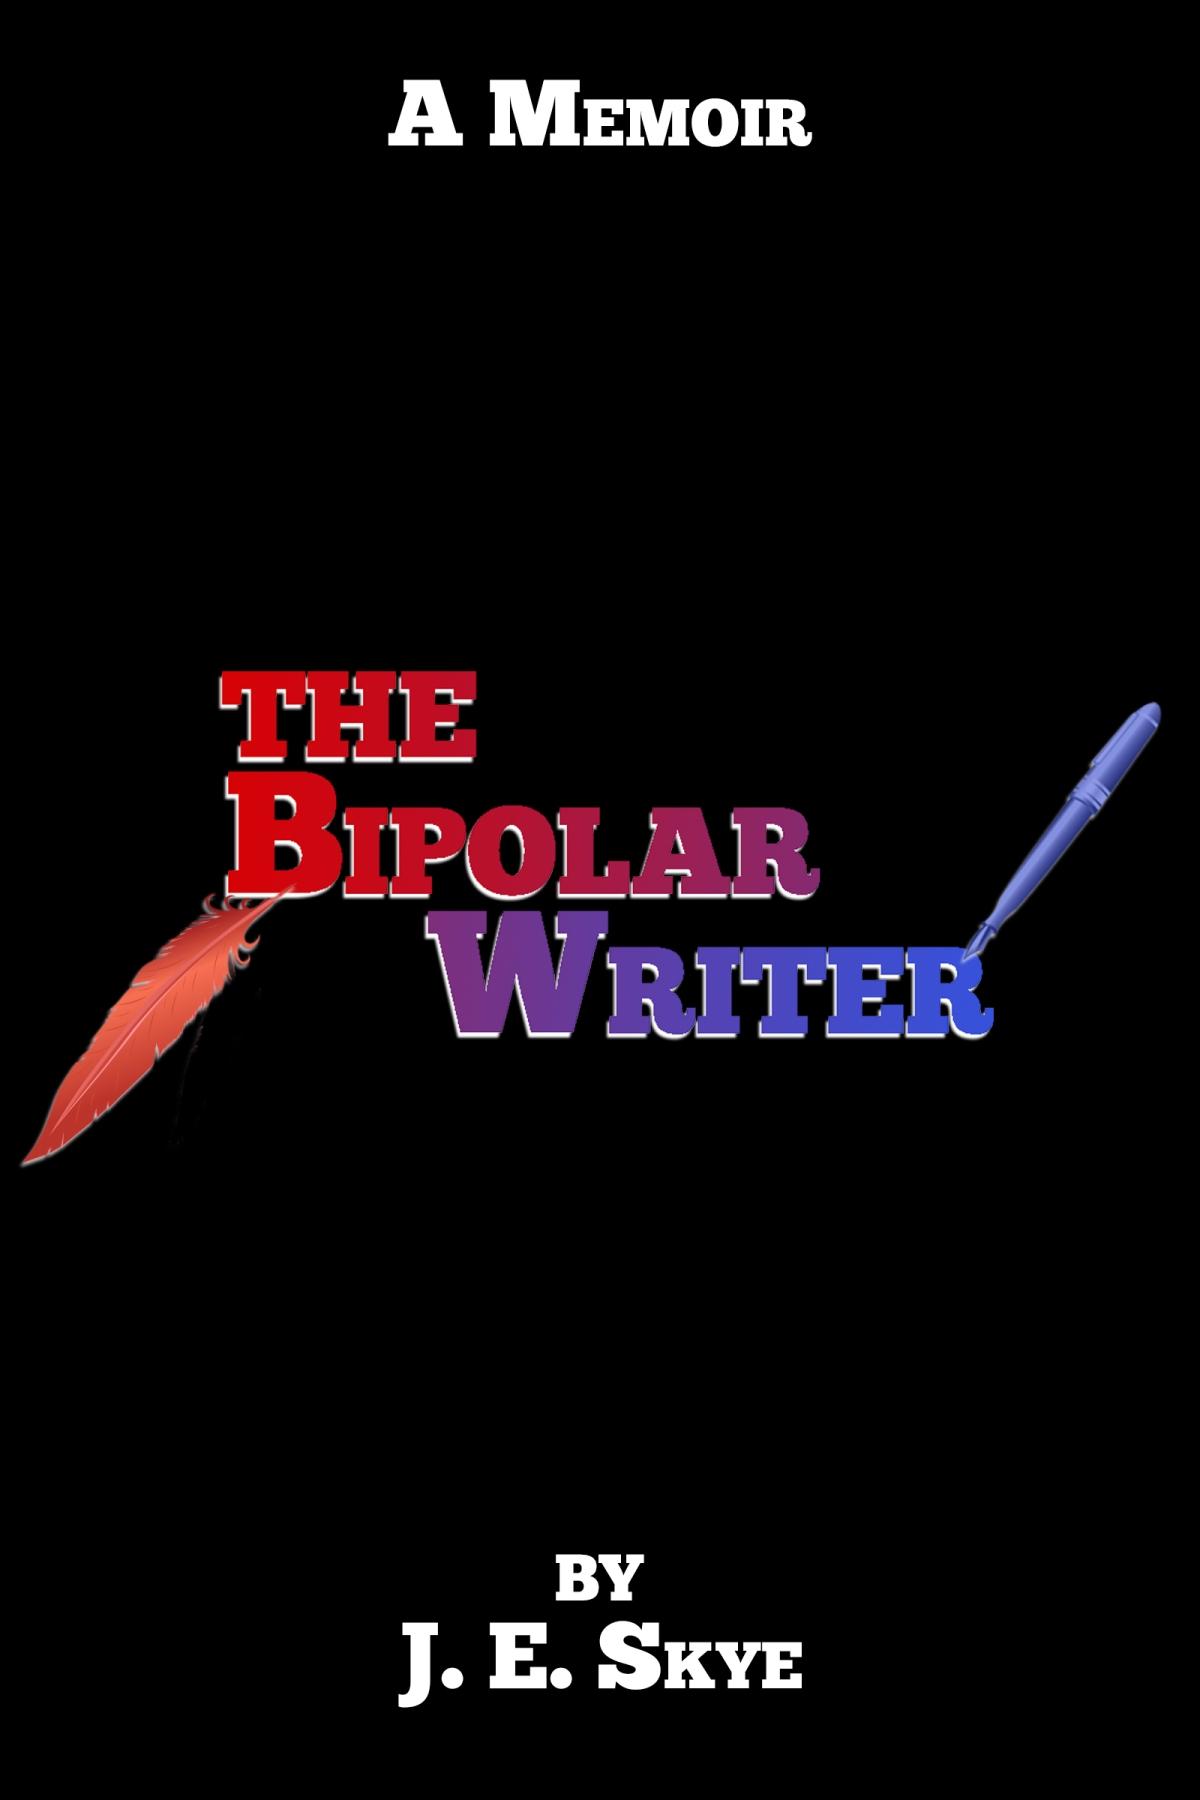 The Bipolar Writer: A Memoir  – Book Release onAmazon